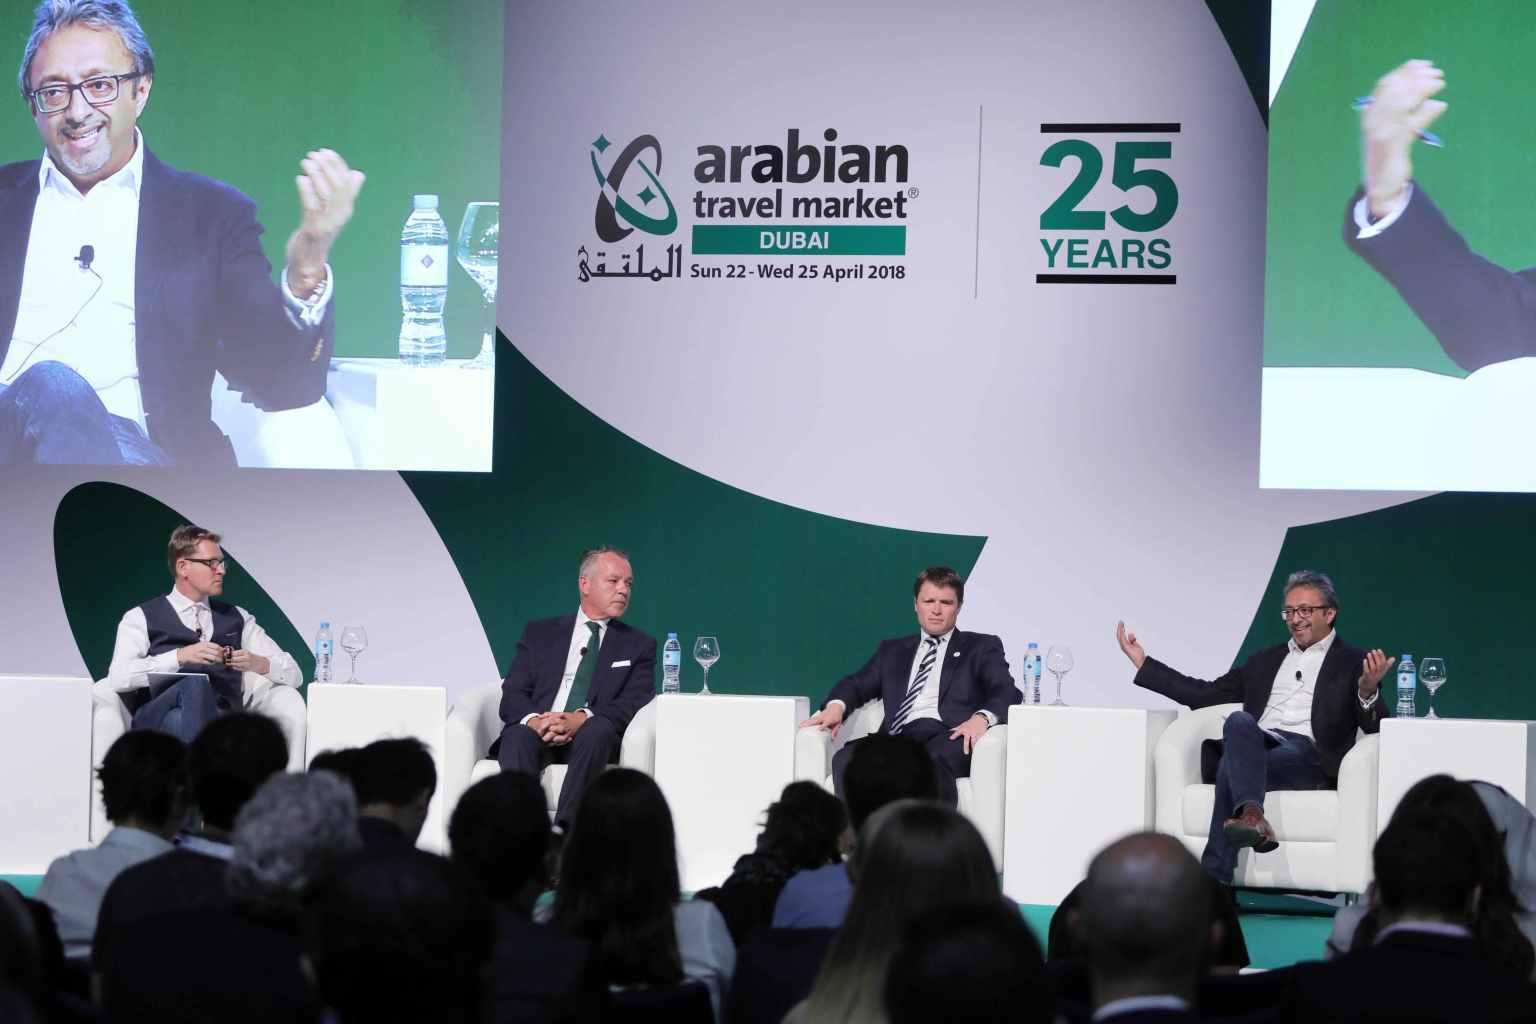 #ATM 2018:Hyperloop could transit passengers between Al Maktoum International and Dubai International in six minutes, says expert